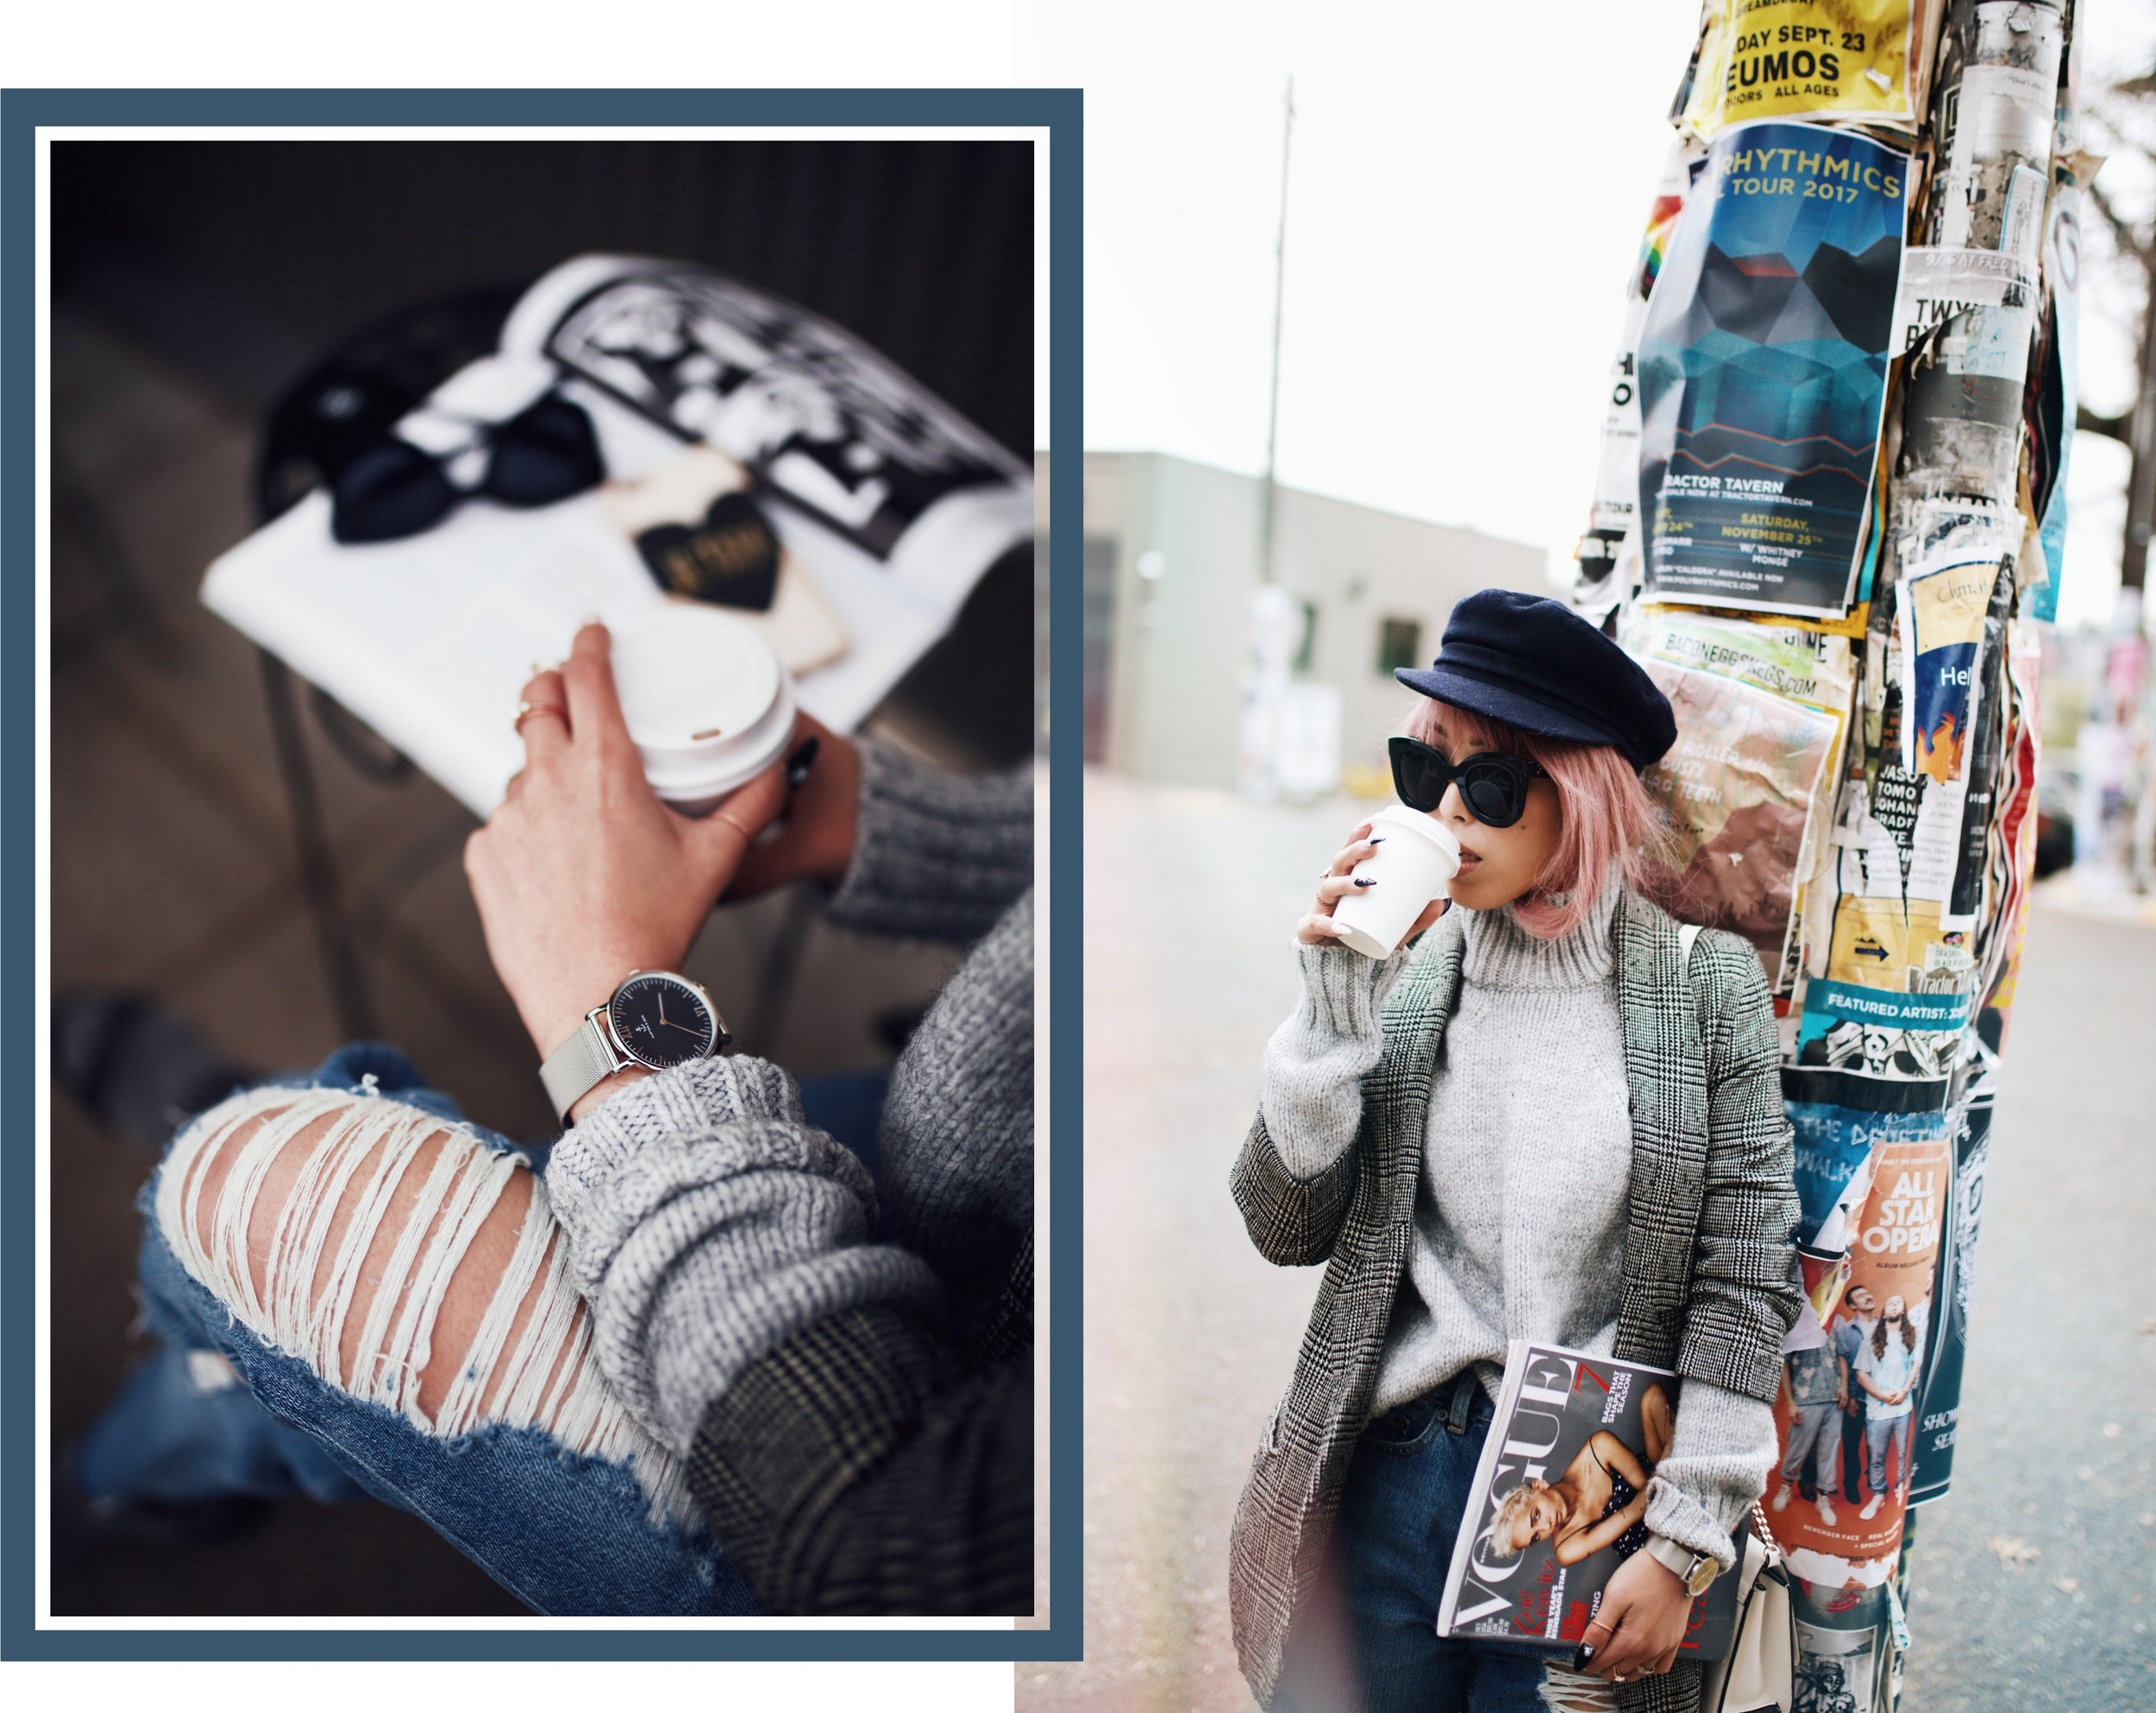 Kapten and Son watch-Zara Gray Turtleneck Sweater-Nordstrom Checked Blazer-ASOS Distressed frayed hem jeans-NAIGAI Glitter Ankle Socks-Black scrappy sandals-H&M White Crossbody Bag-Aritzia Fisherman Hat-Aika's Love Closet-Seattle fashion style blogger-pink hair-Japanese7